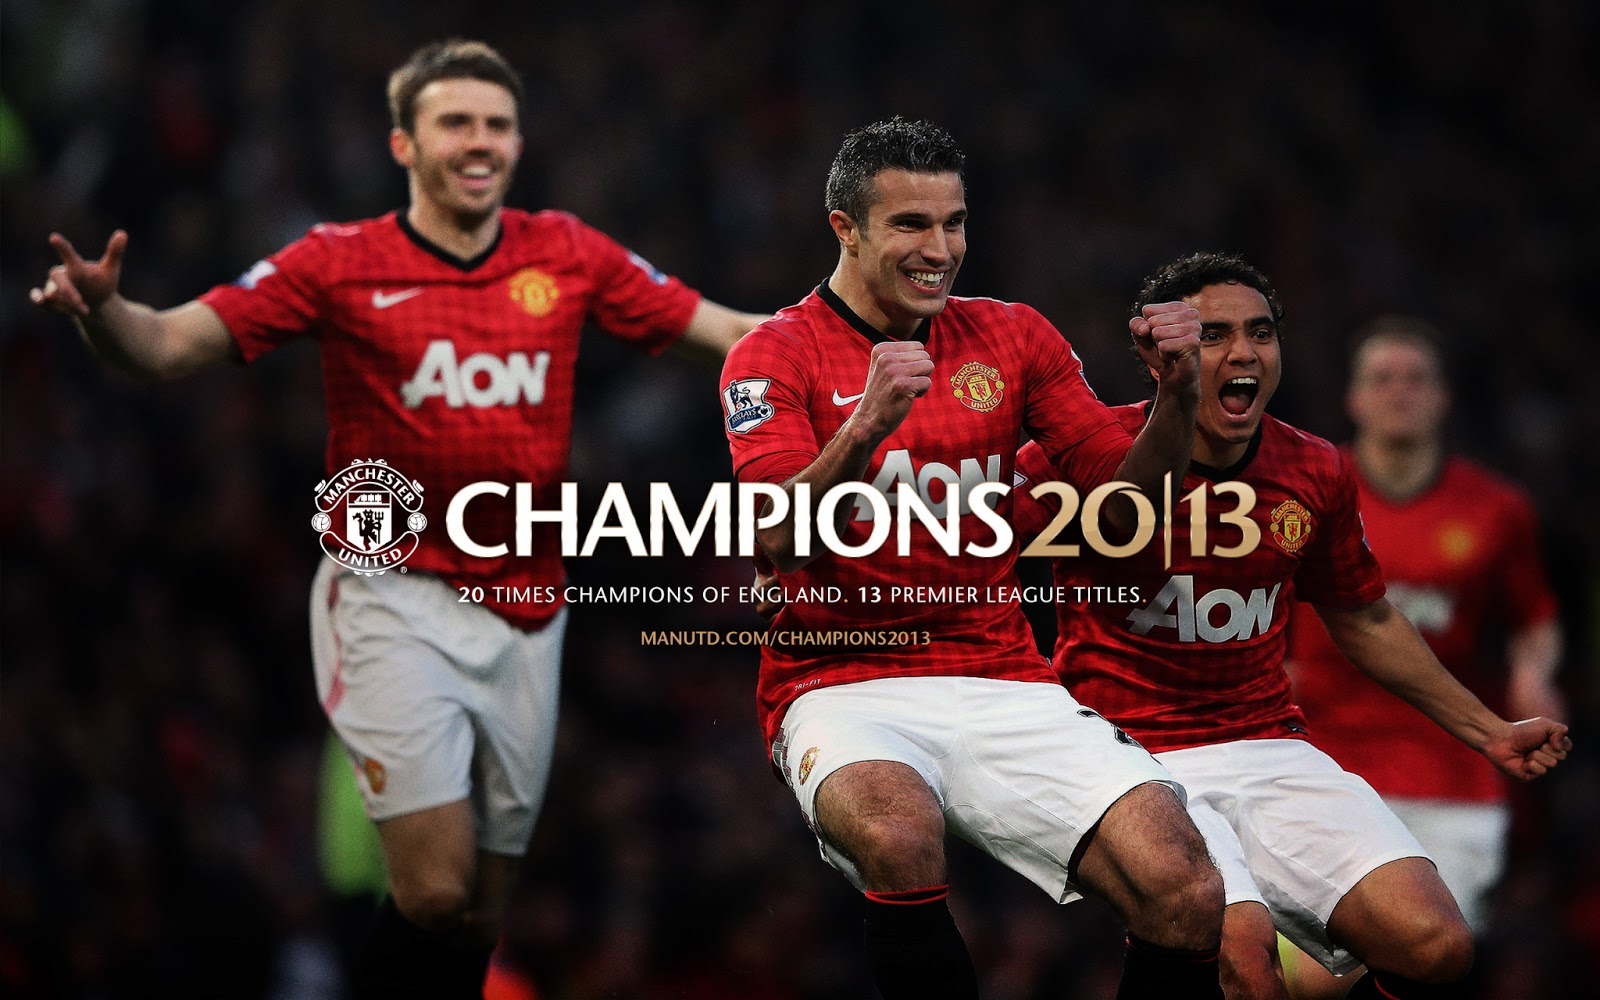 Kuala Lumpur Manchester United Champions 2013 Barclays Premier League